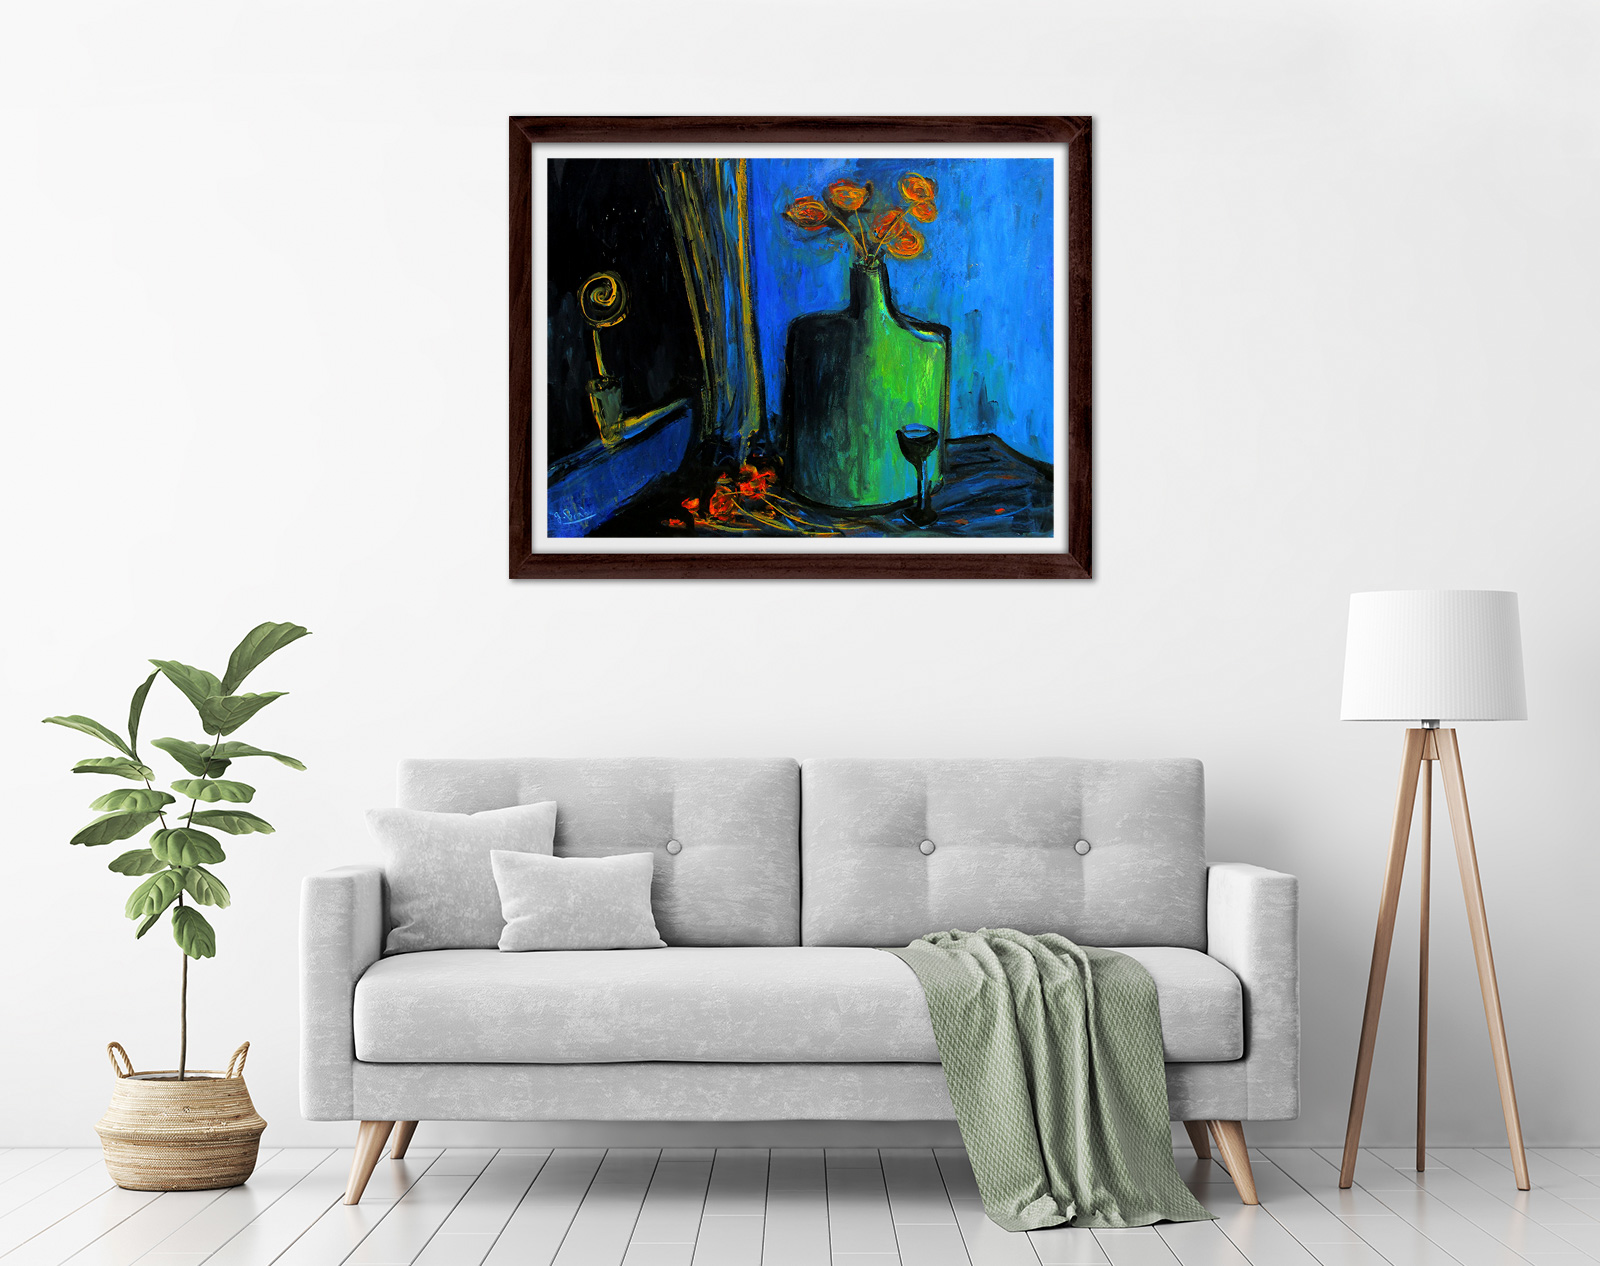 Glenn Brady - 'Flowers in a Flagon' Framed in a room